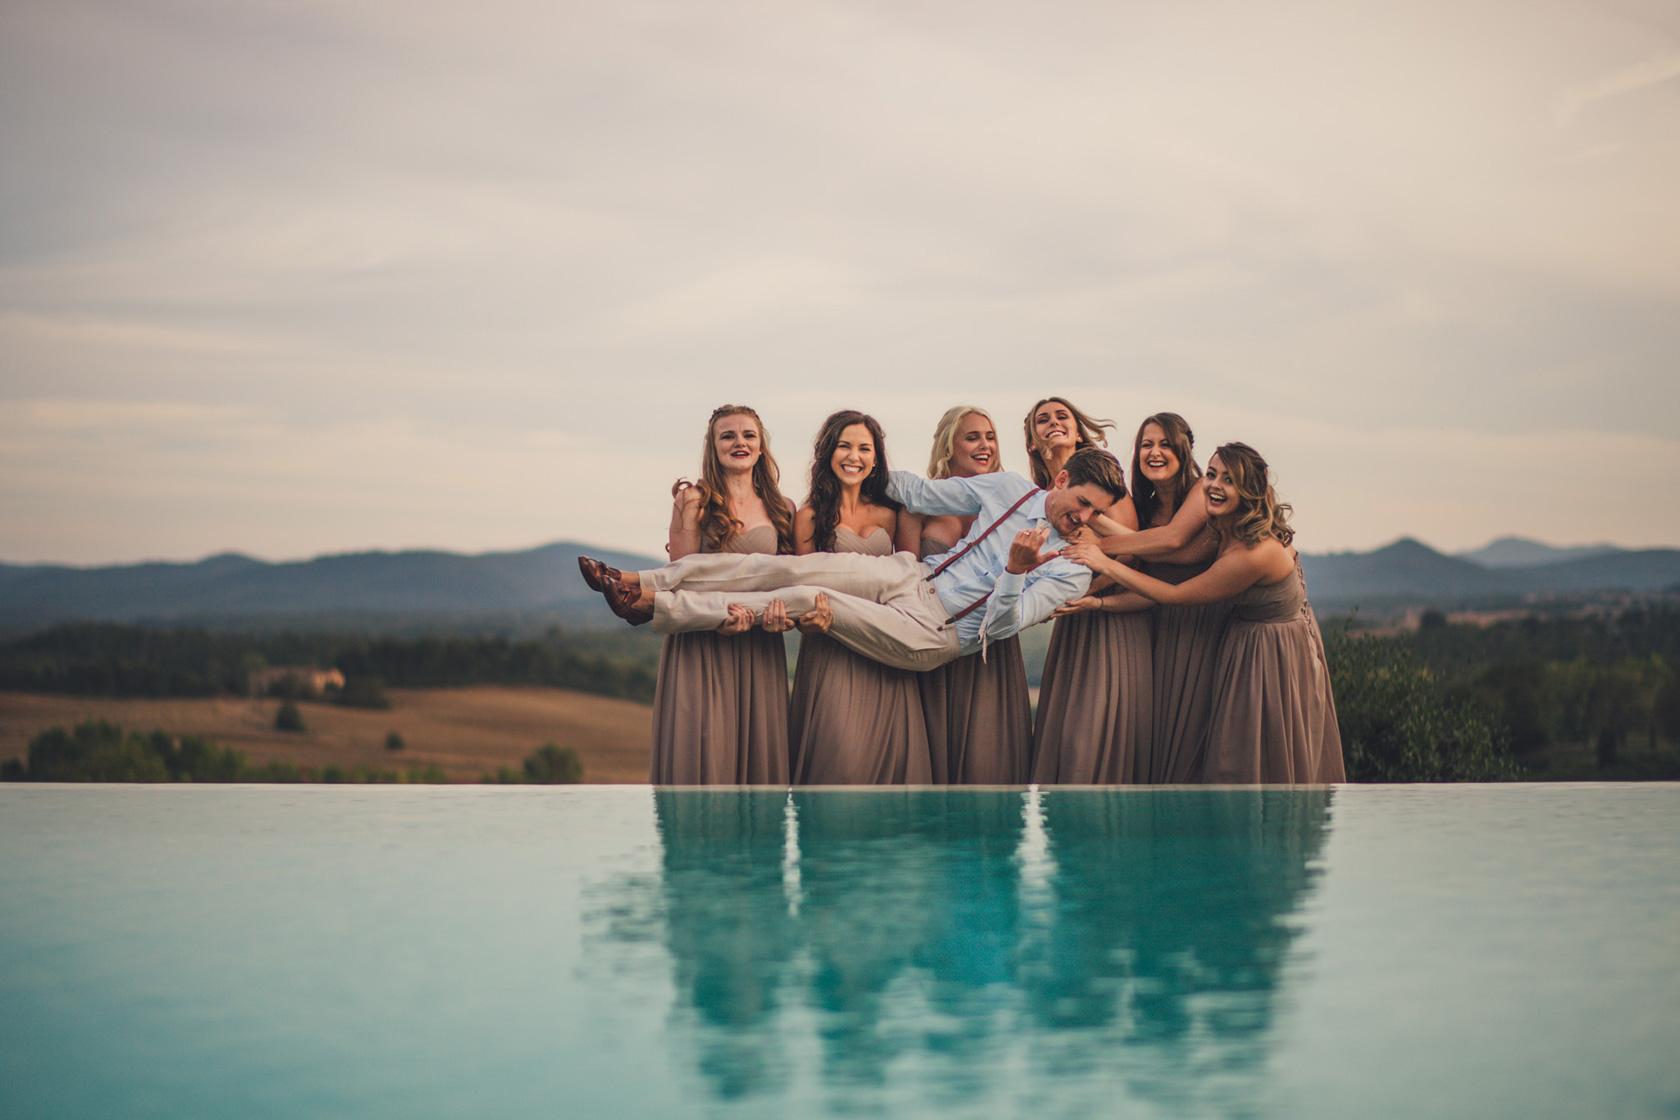 http://www.tenutadipapena.it/wp-content/uploads/2016/11/105-Wedding-Tuscany-SanGalgano-1.jpg